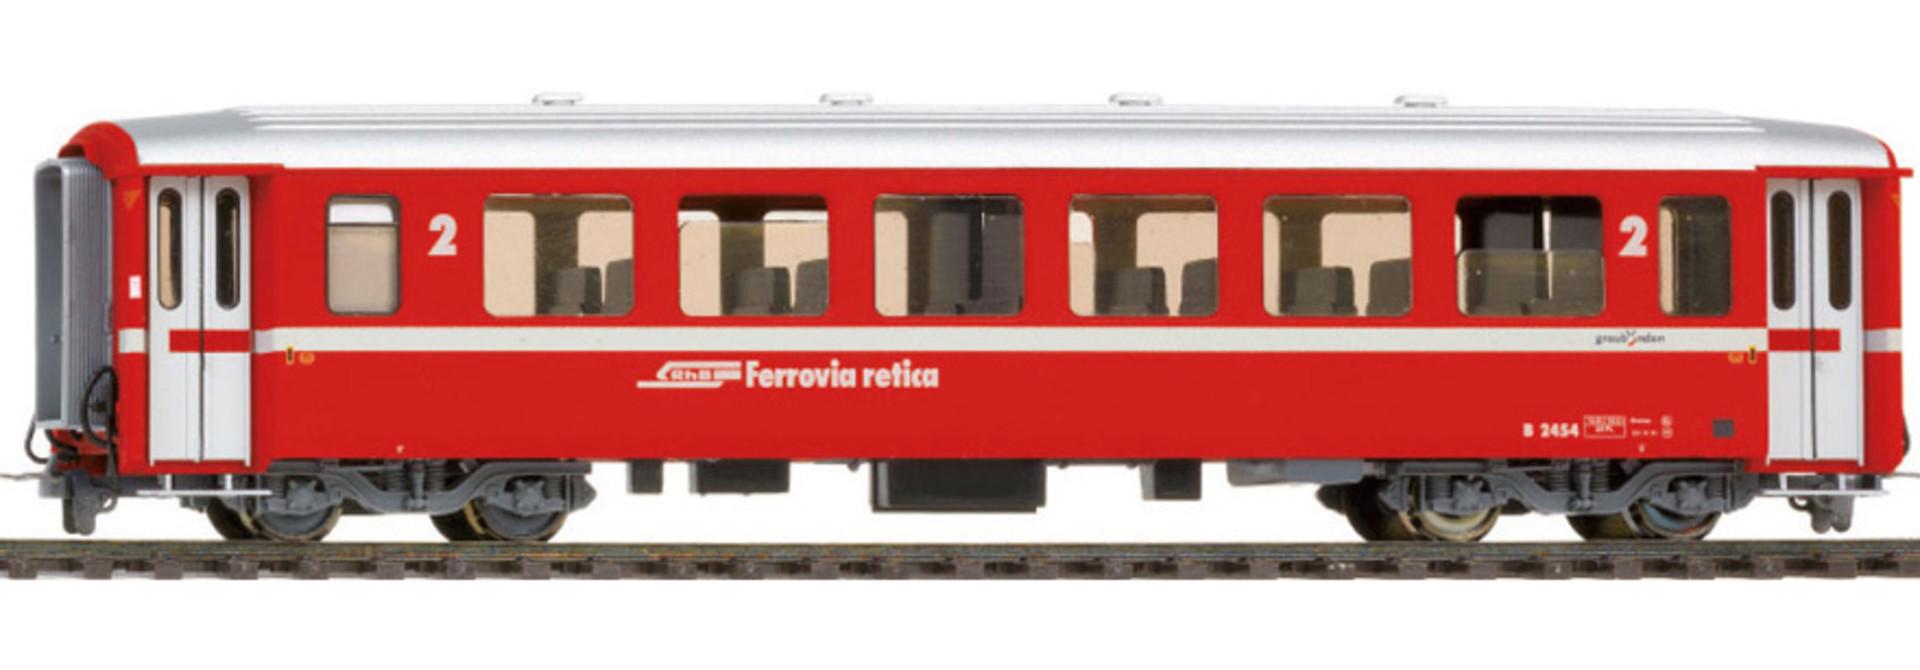 3255160 RhB B 2307 EW I Berninabahn neurot